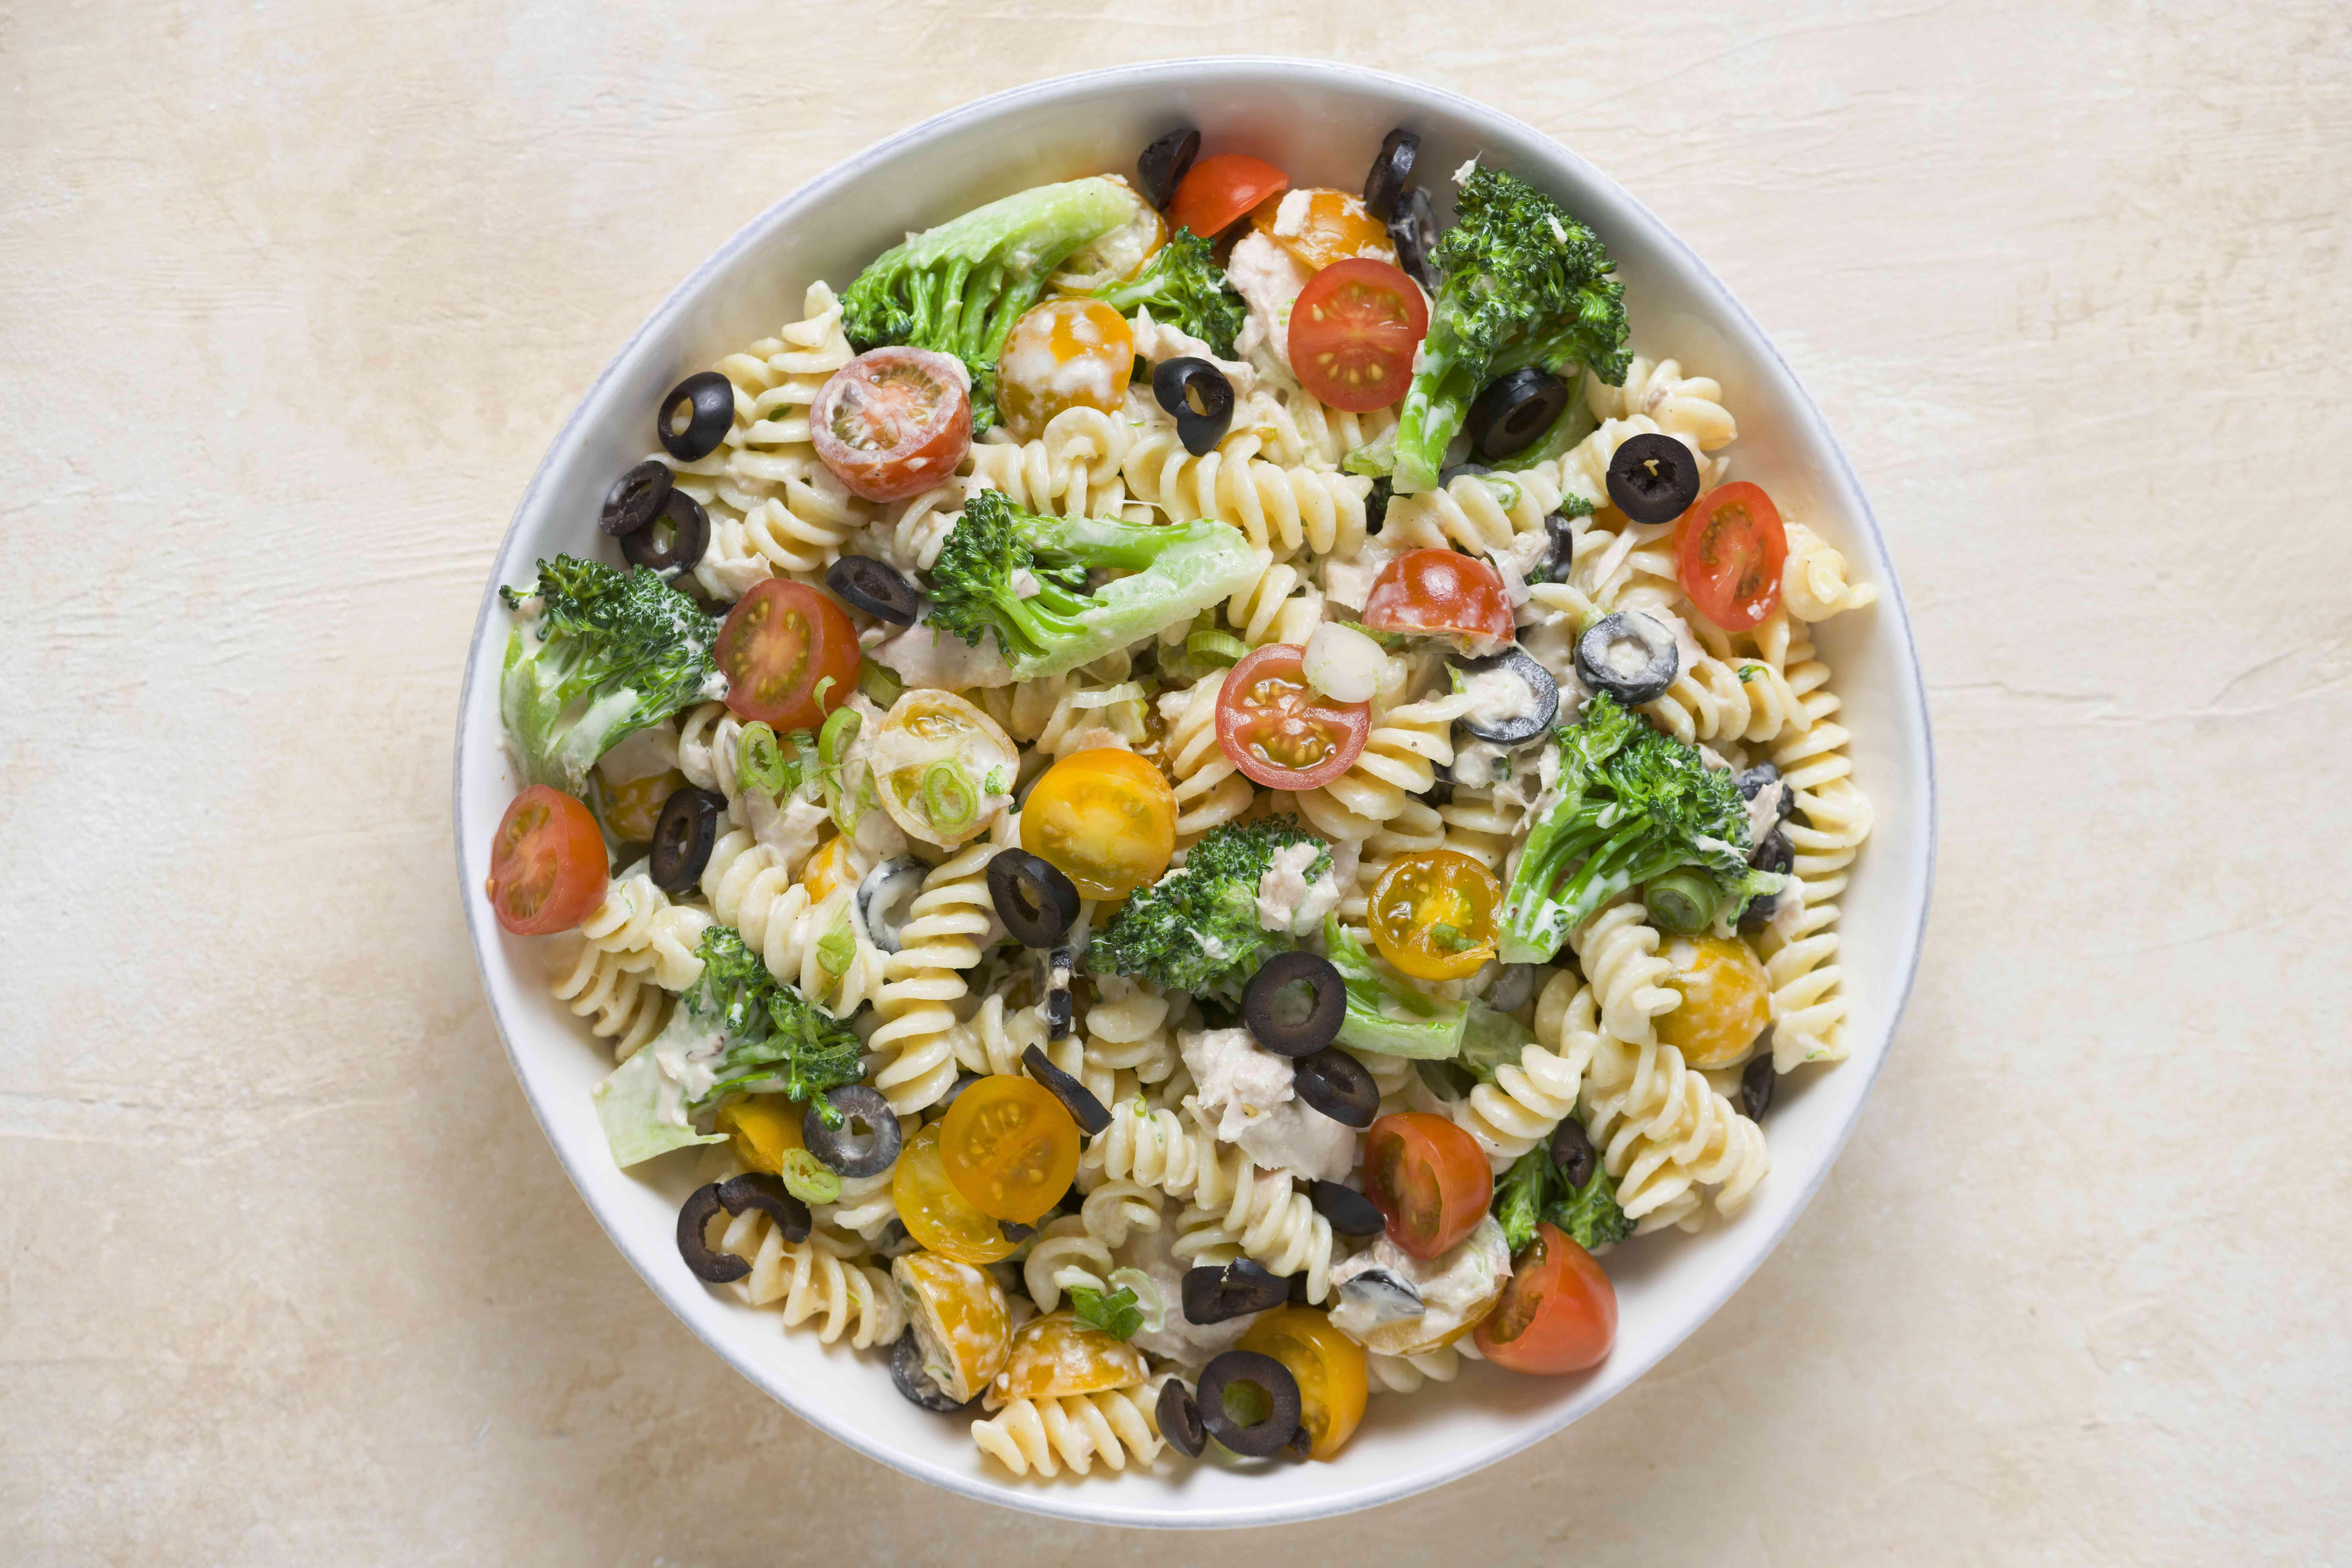 Tuna and Veggie Pasta Salad (Parve) in a bowl